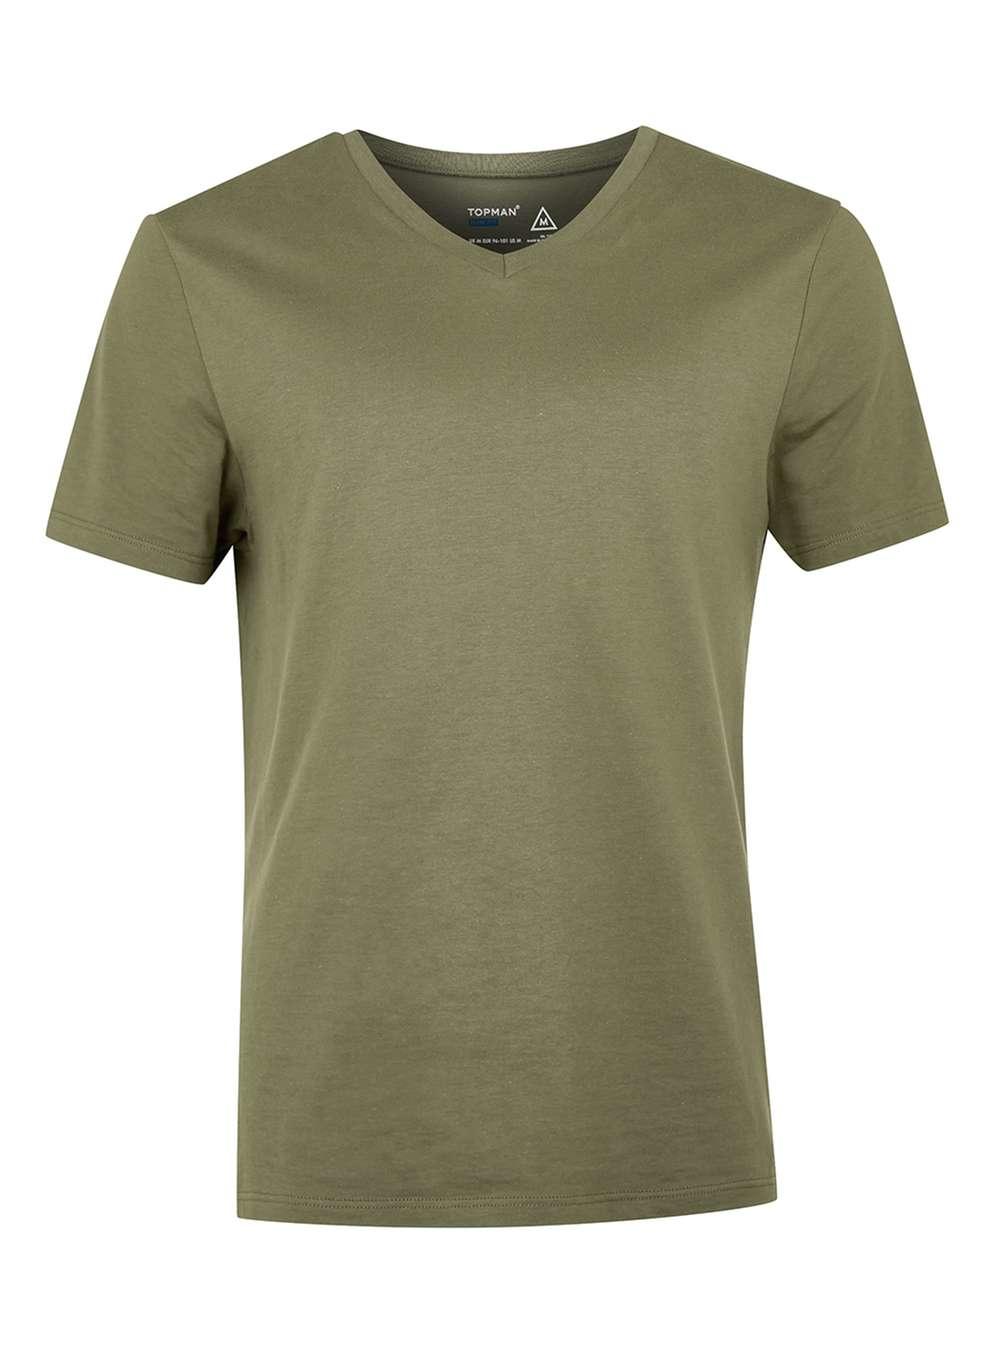 lyst topman khaki slim fit v neck t shirt in green for men. Black Bedroom Furniture Sets. Home Design Ideas